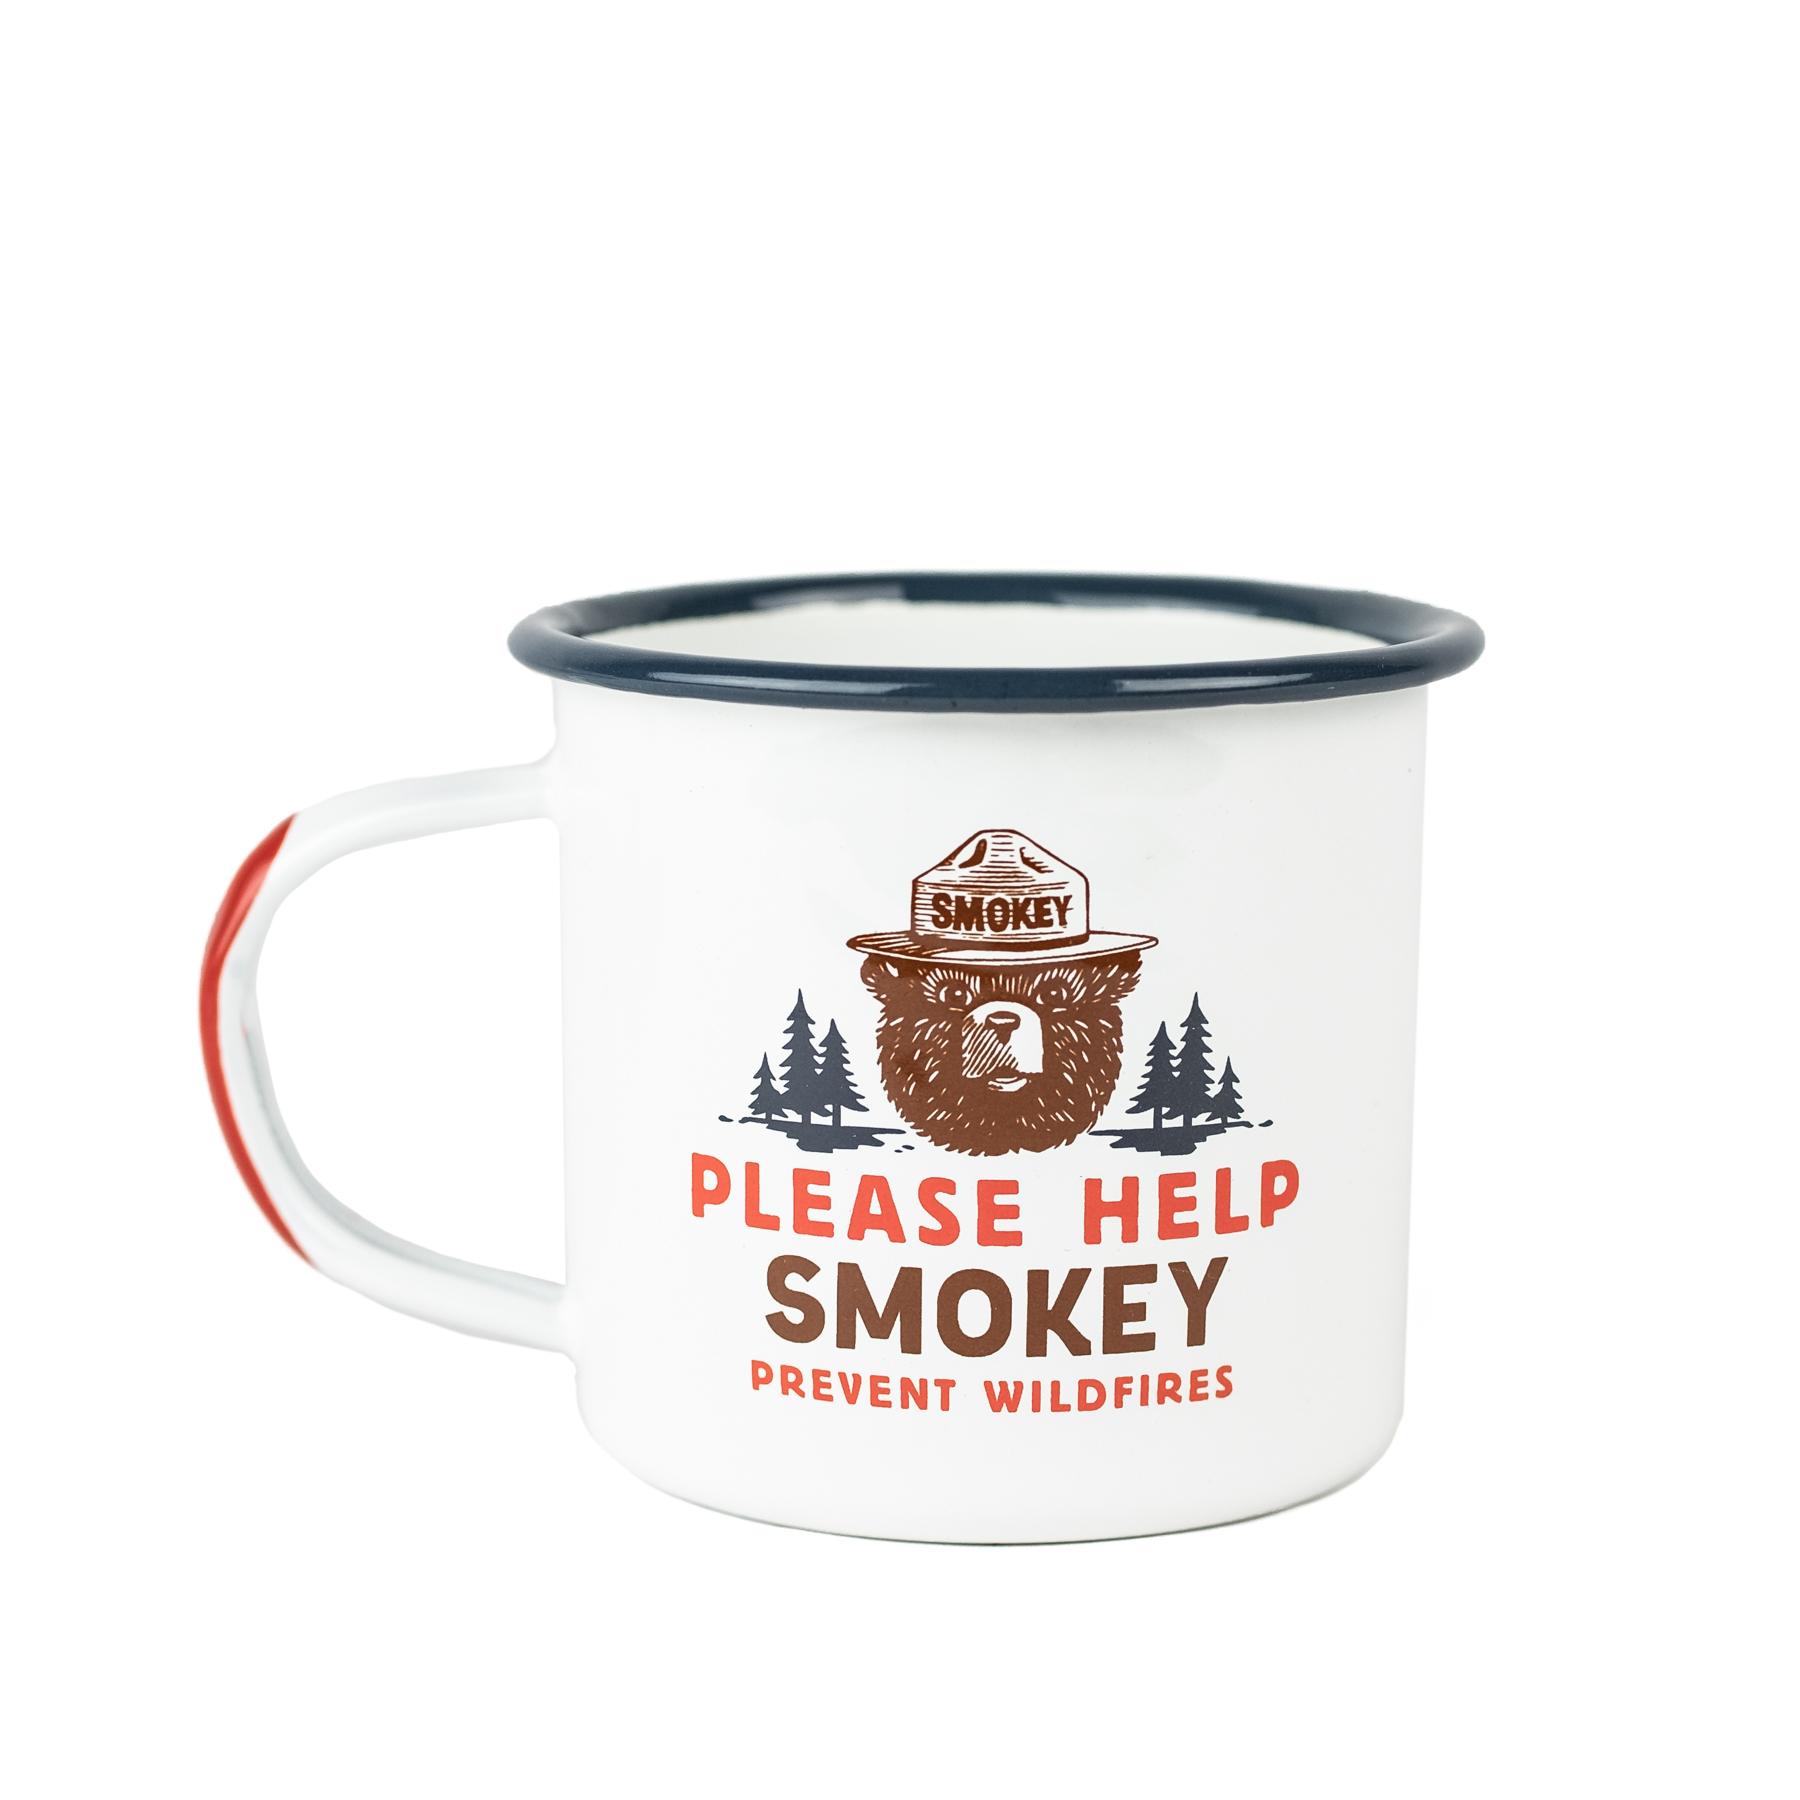 smokey-bear-enamel-mug-3.jpg